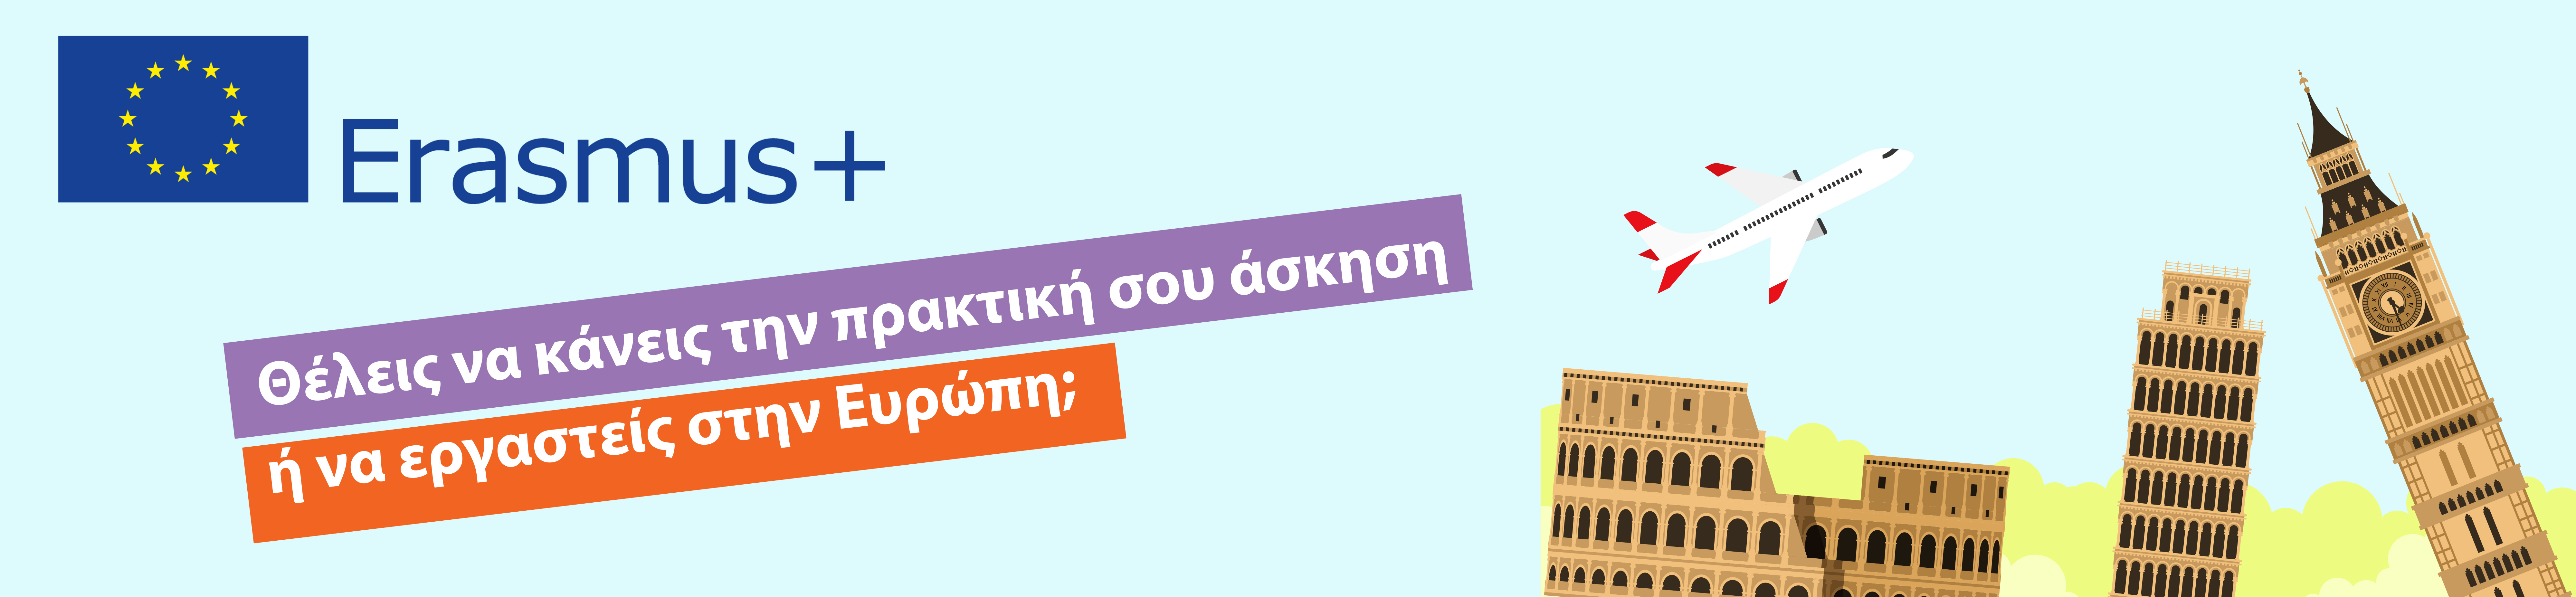 Eνημερωτική Hμερίδα για το Πρόγραμμα Erasmus+